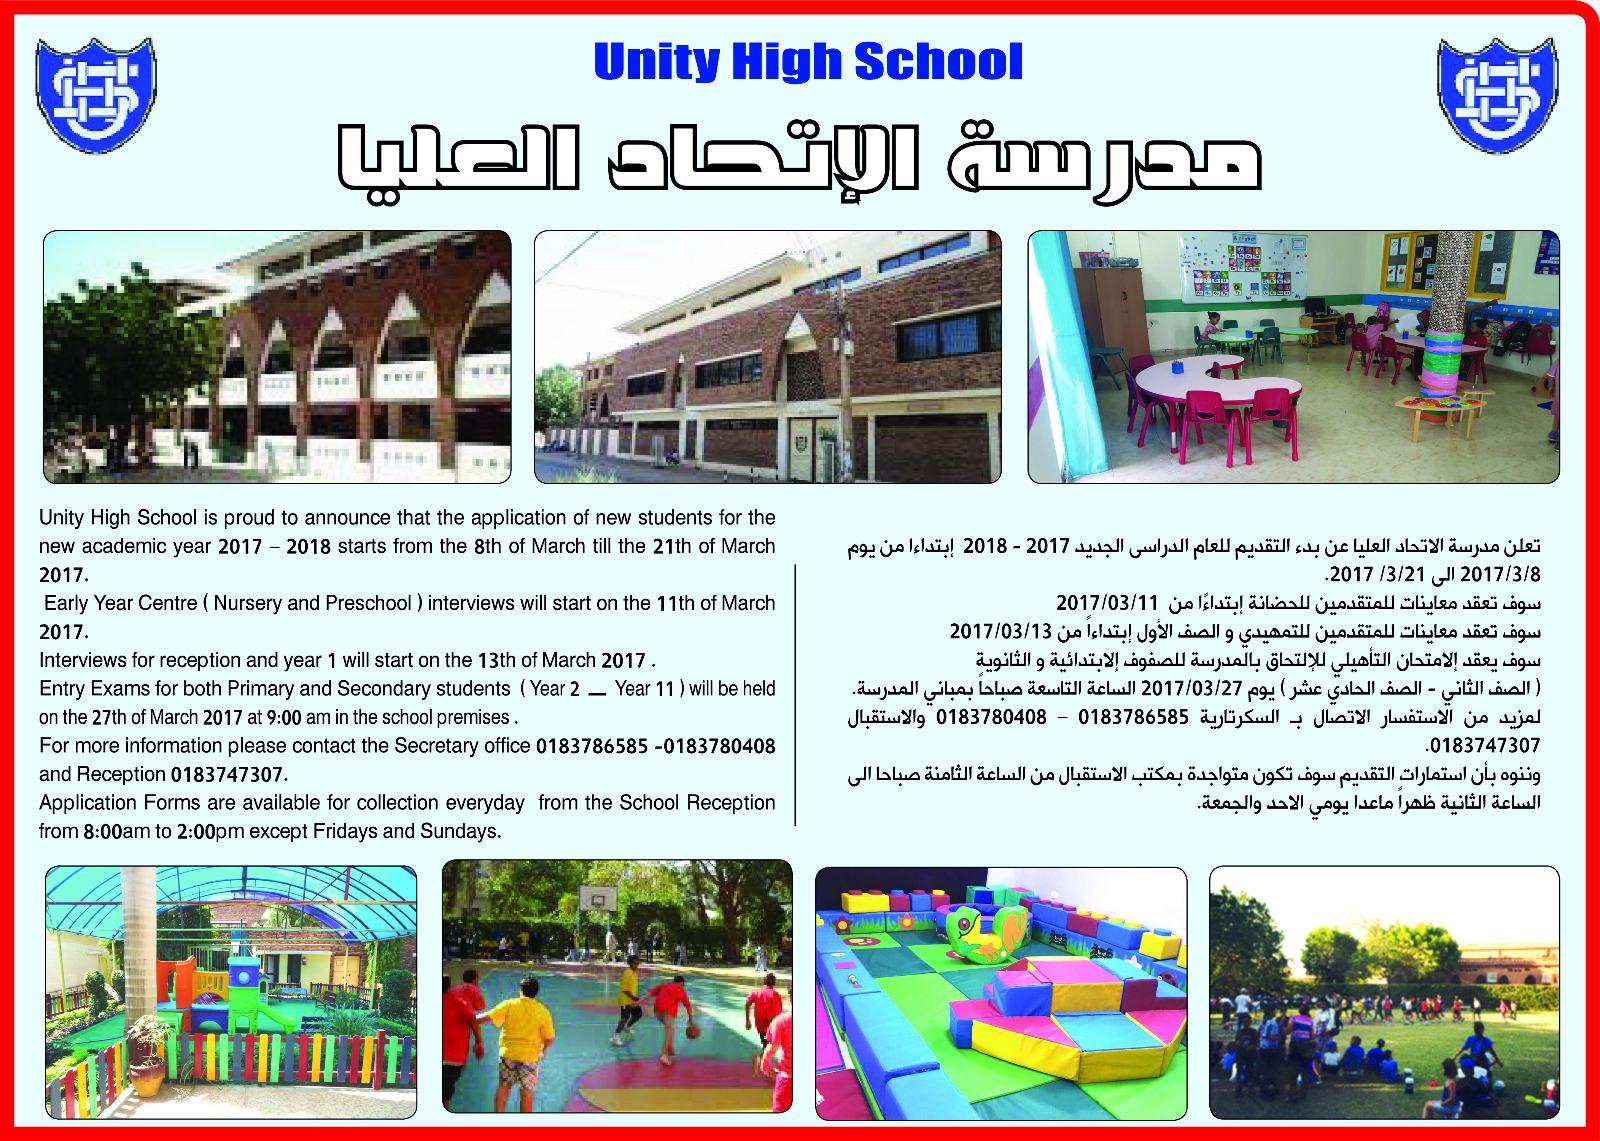 uhs_17-18_admission